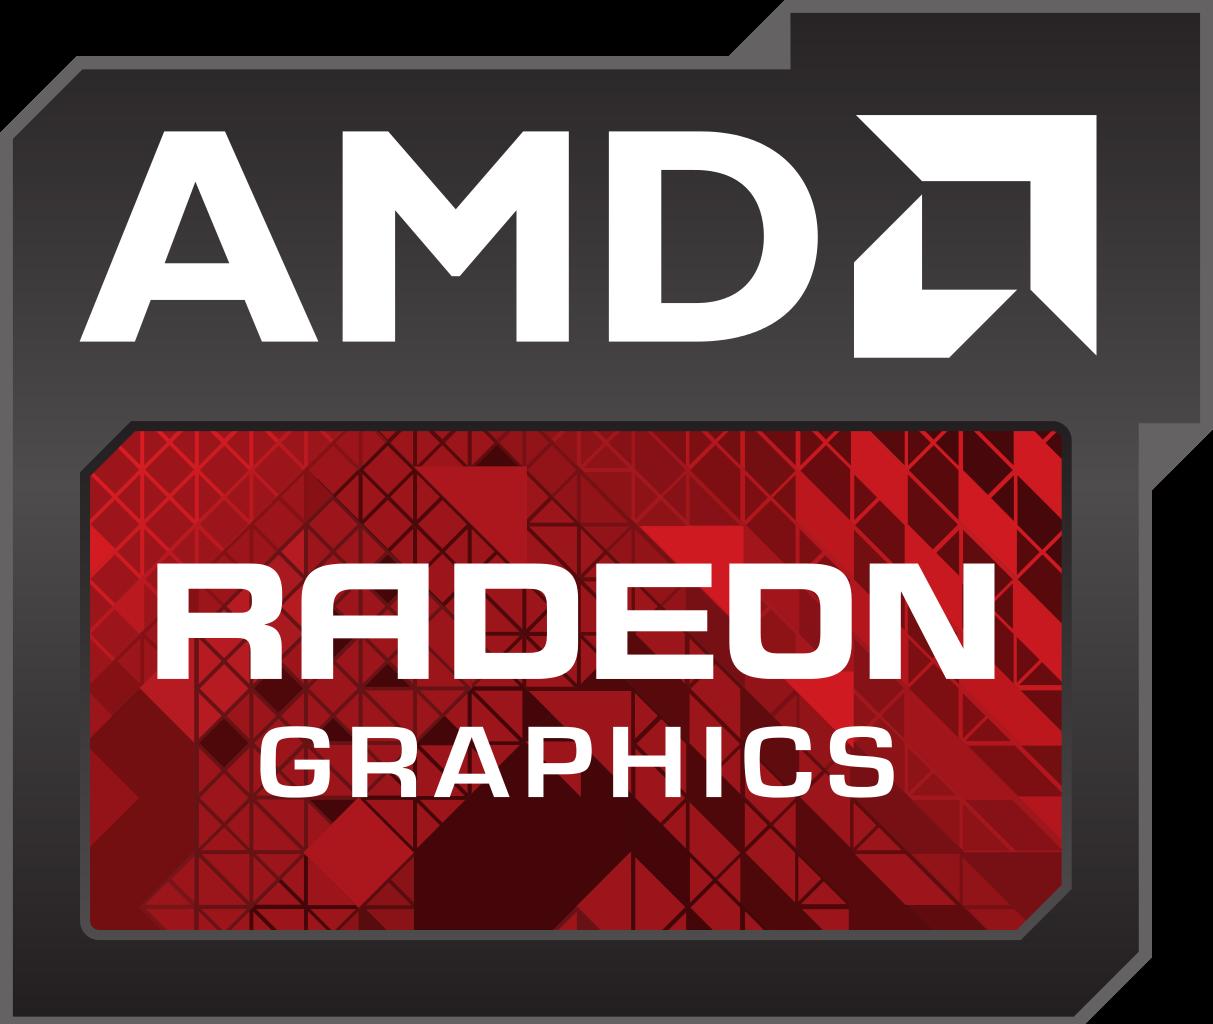 AMD_Radeon_graphics_logo_2014.png